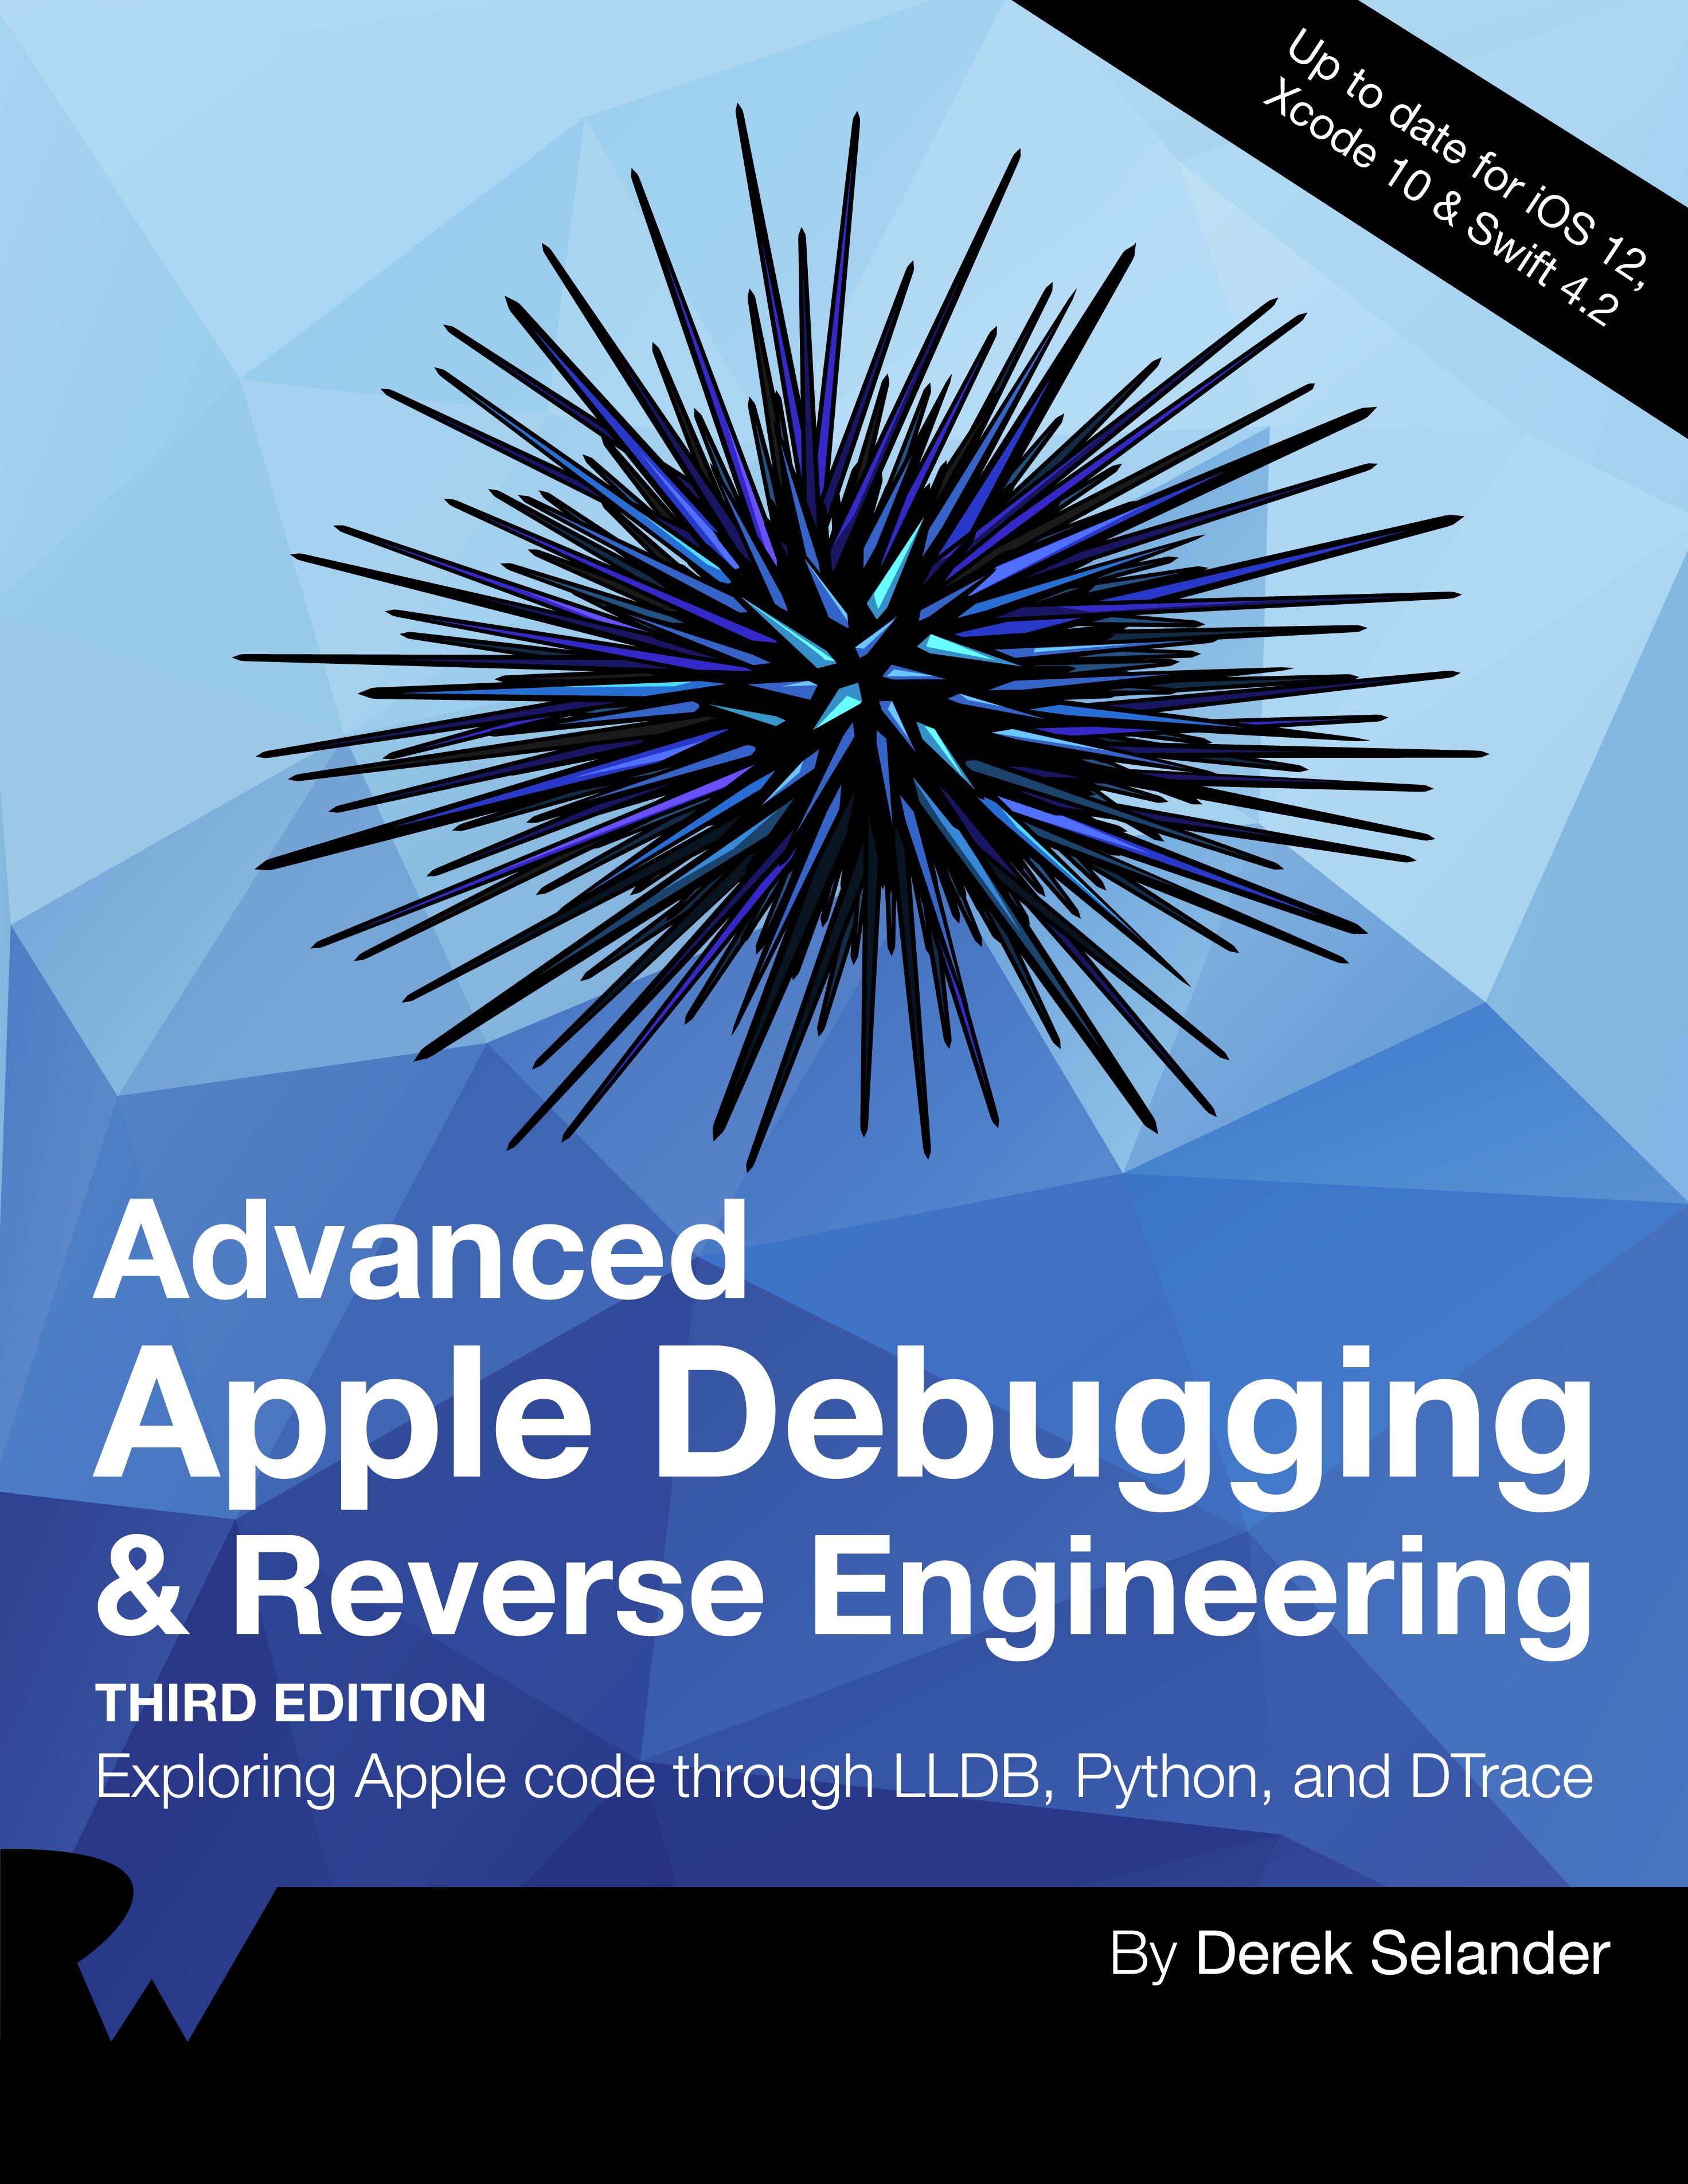 Advanced Apple Debugging & Reverse Engineering